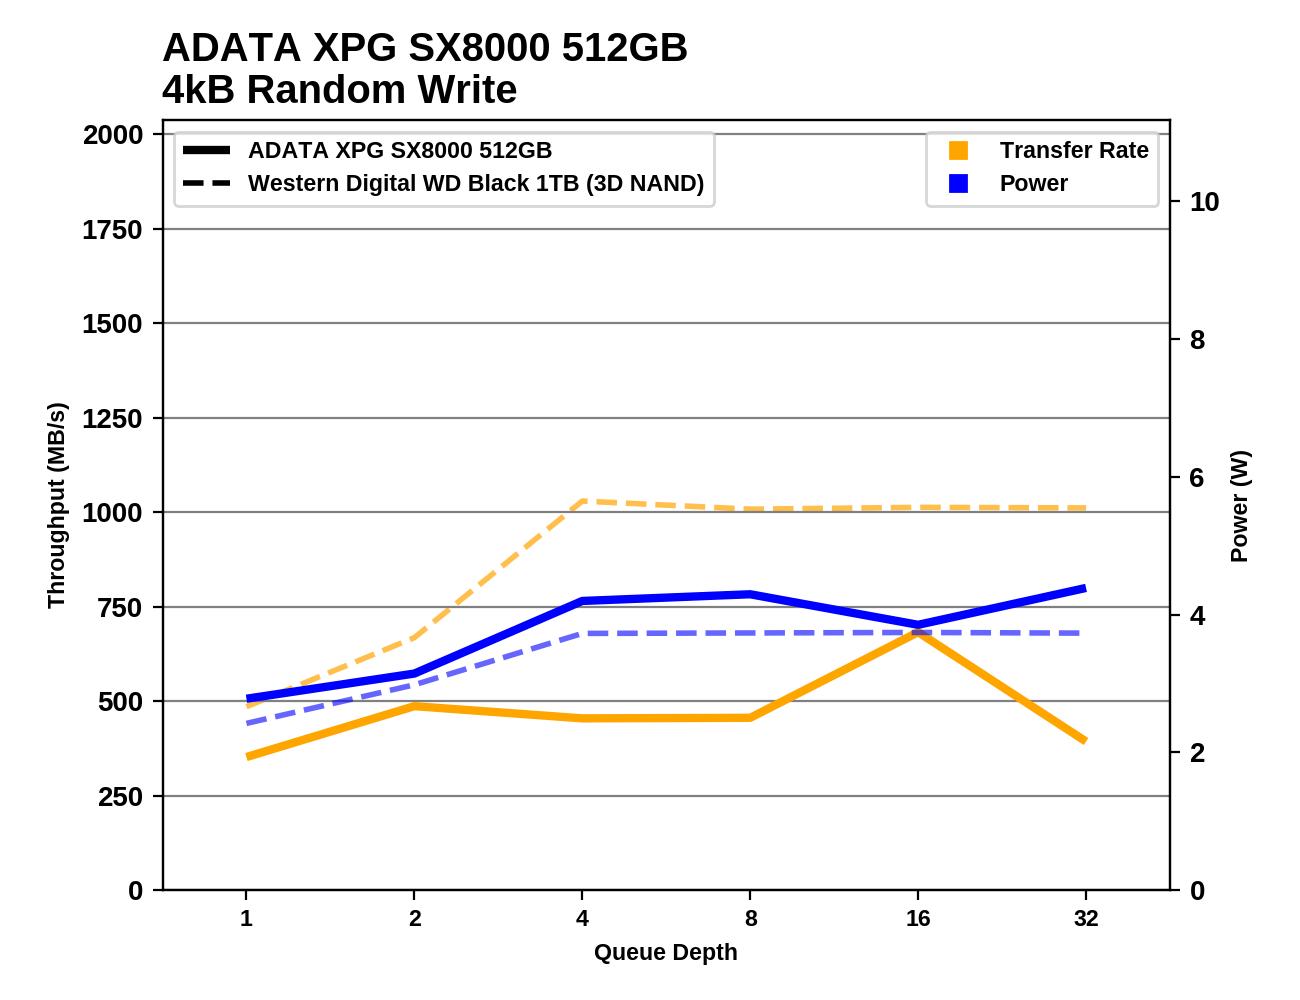 Обзор Western Digital WD Black 3D NAND SSD: EVO встретил равного - 64